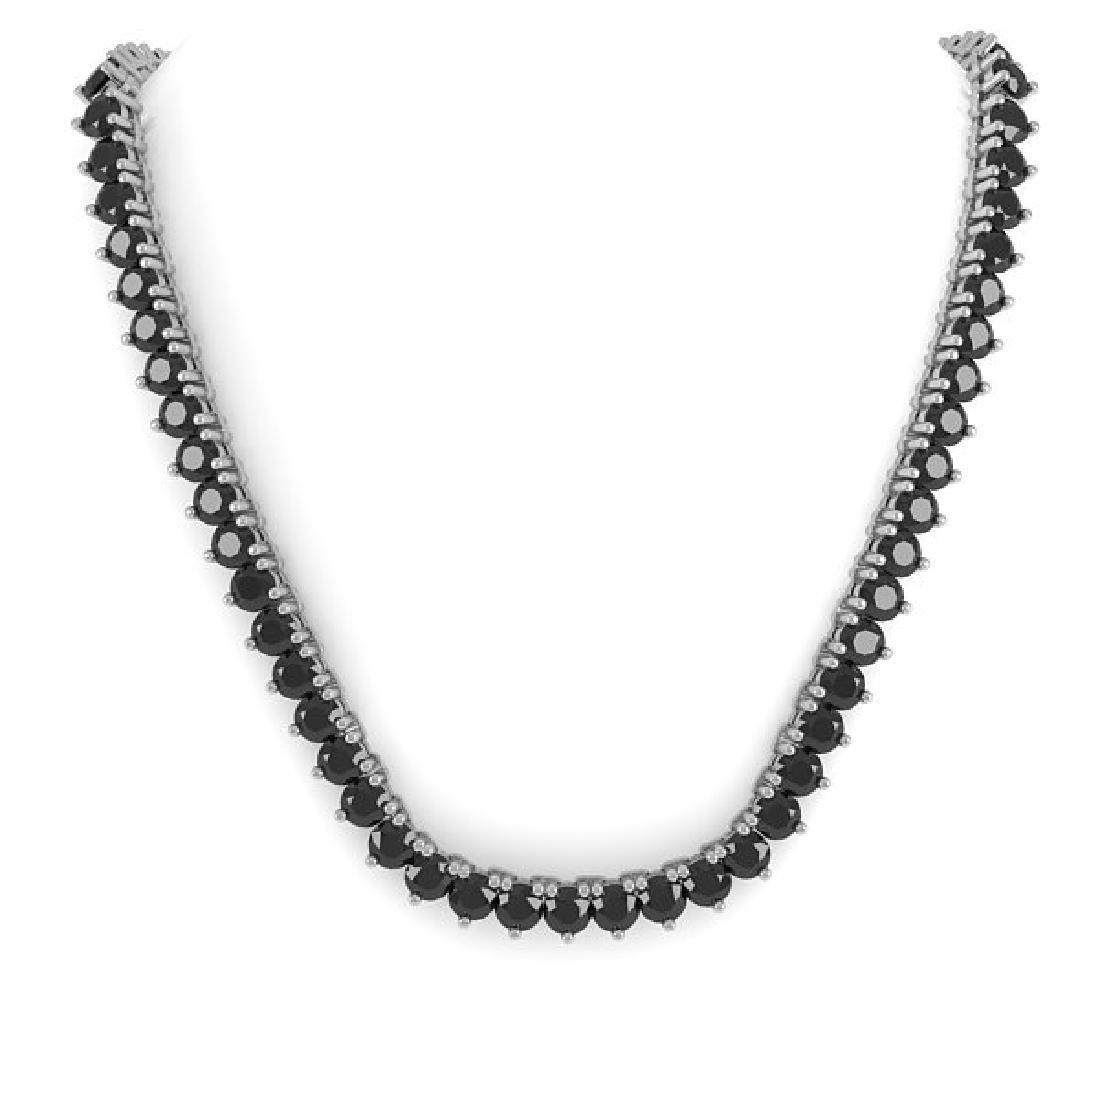 60 CTW Solitaire Certified Black VS Diamond Necklace - 3